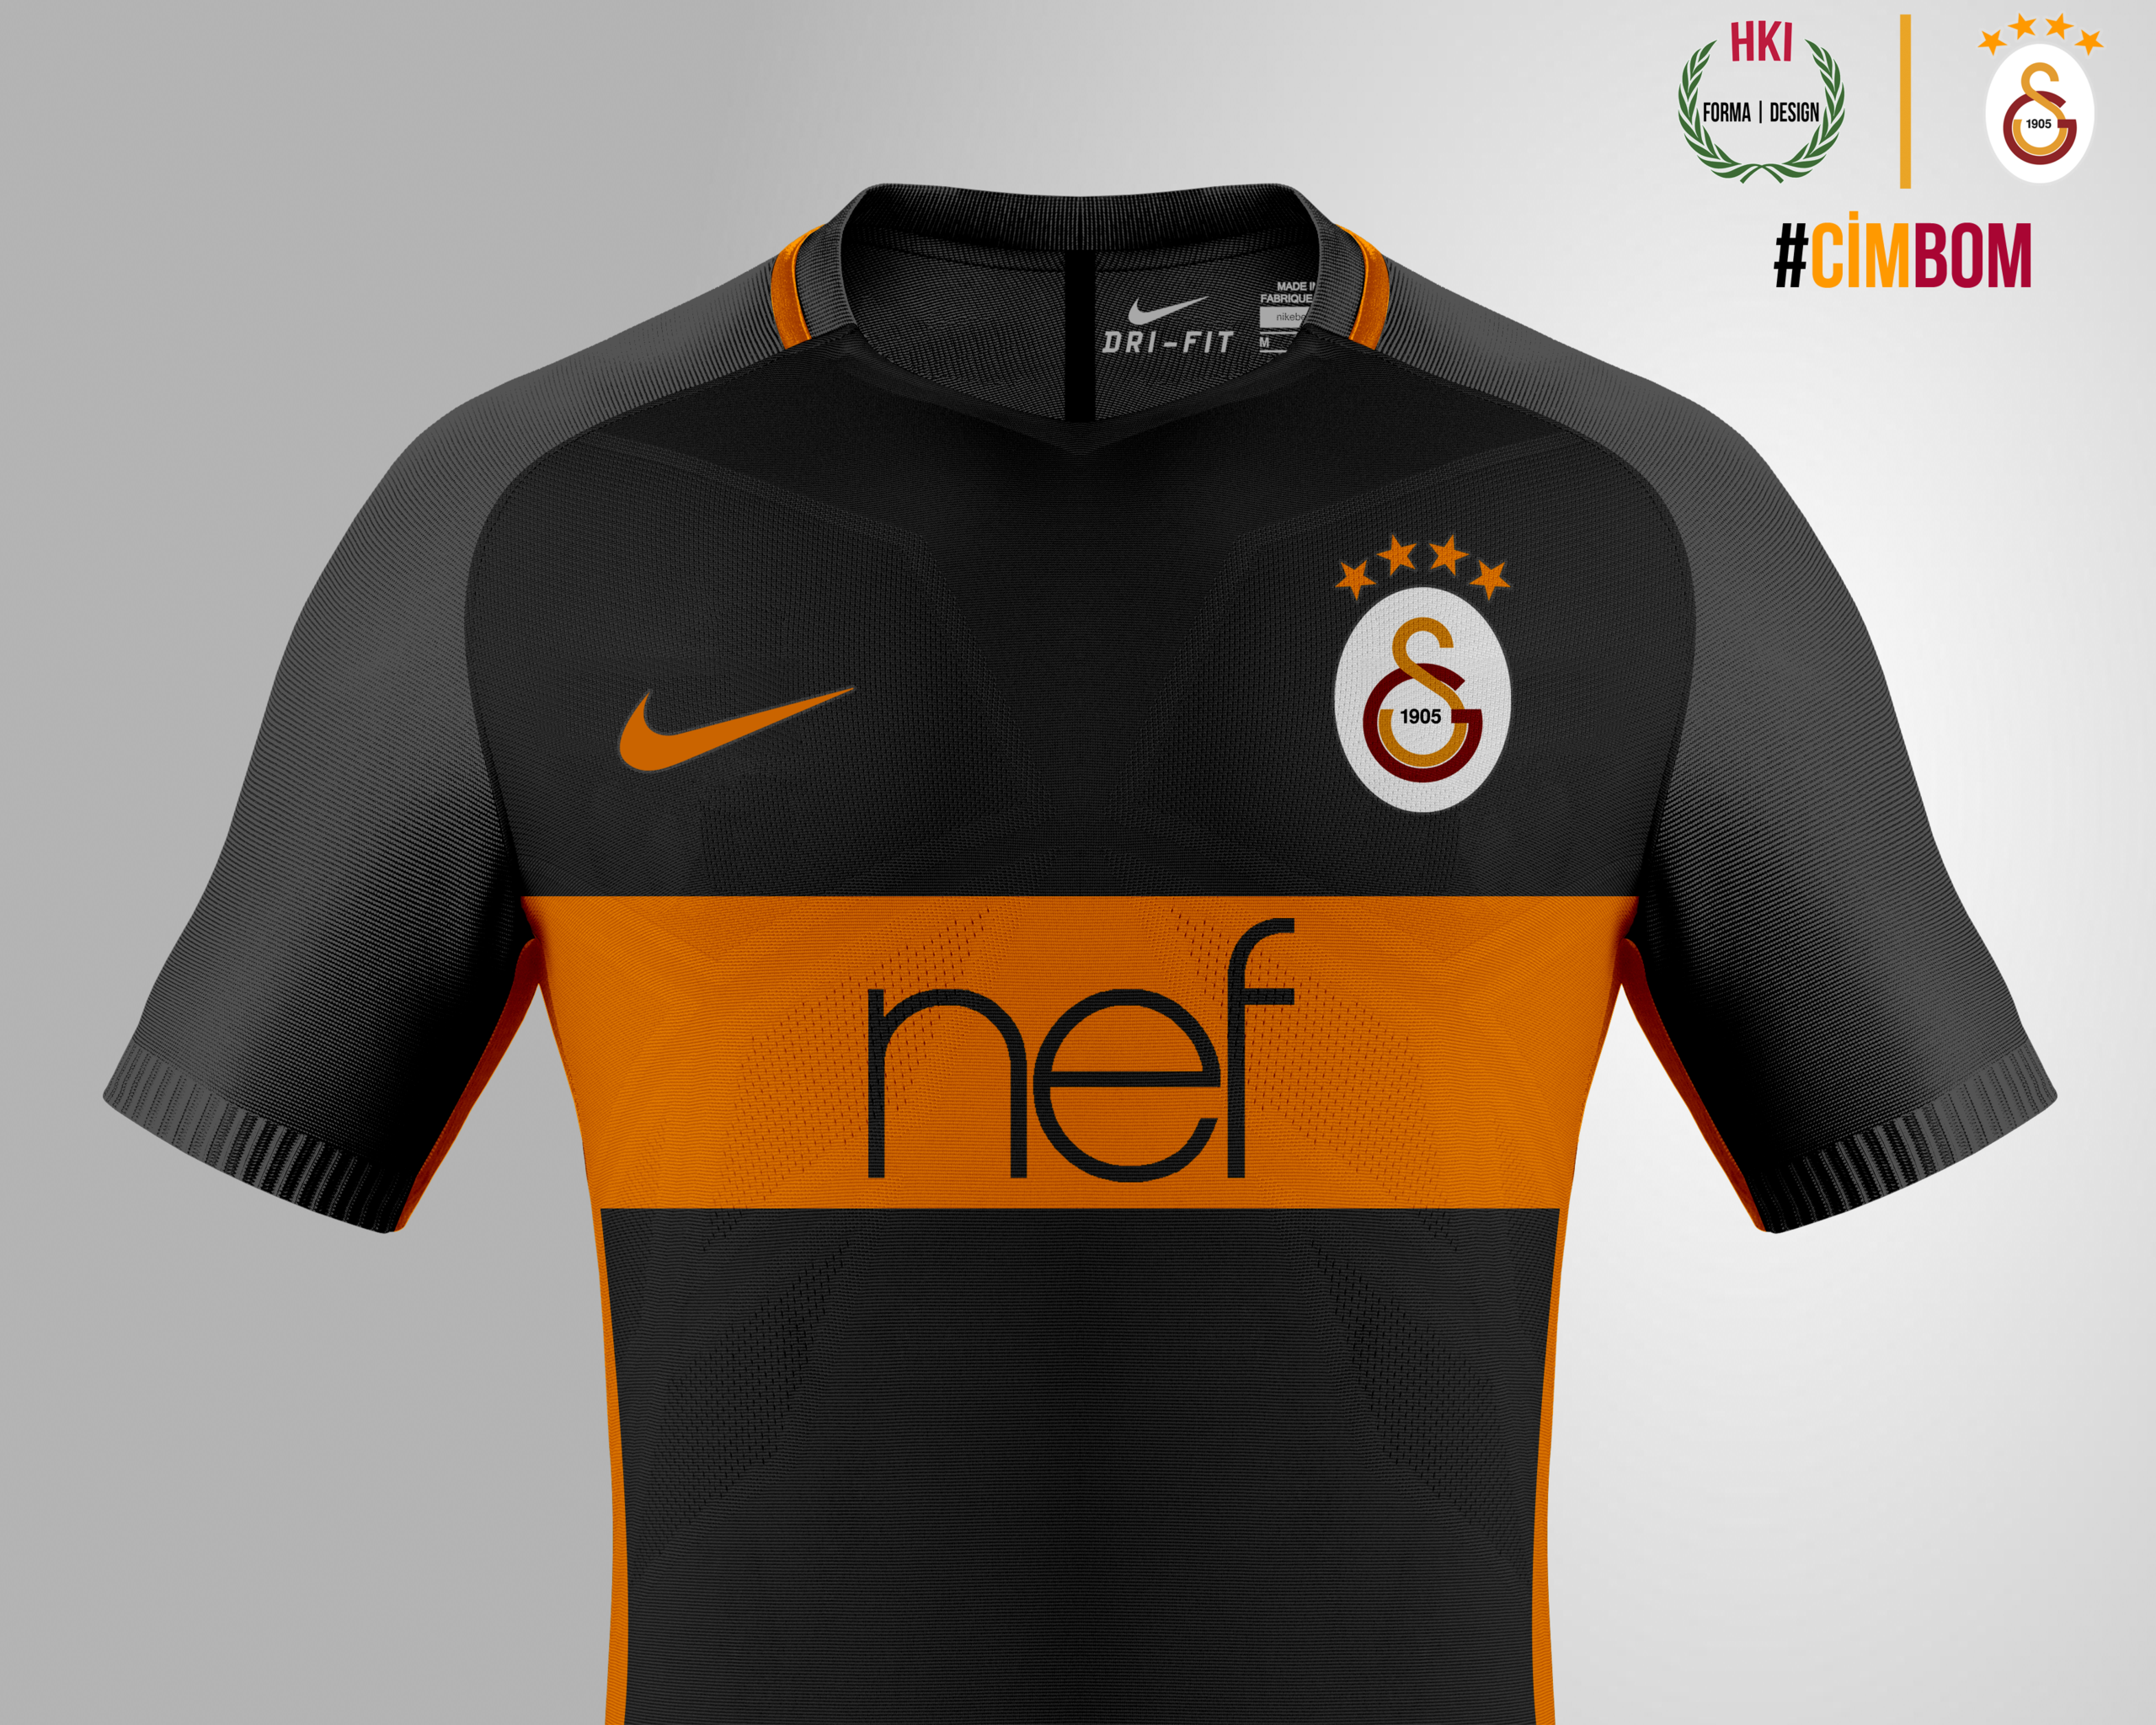 brand new 37aa2 7b8b2 Galatasaray x Nike consept away kit